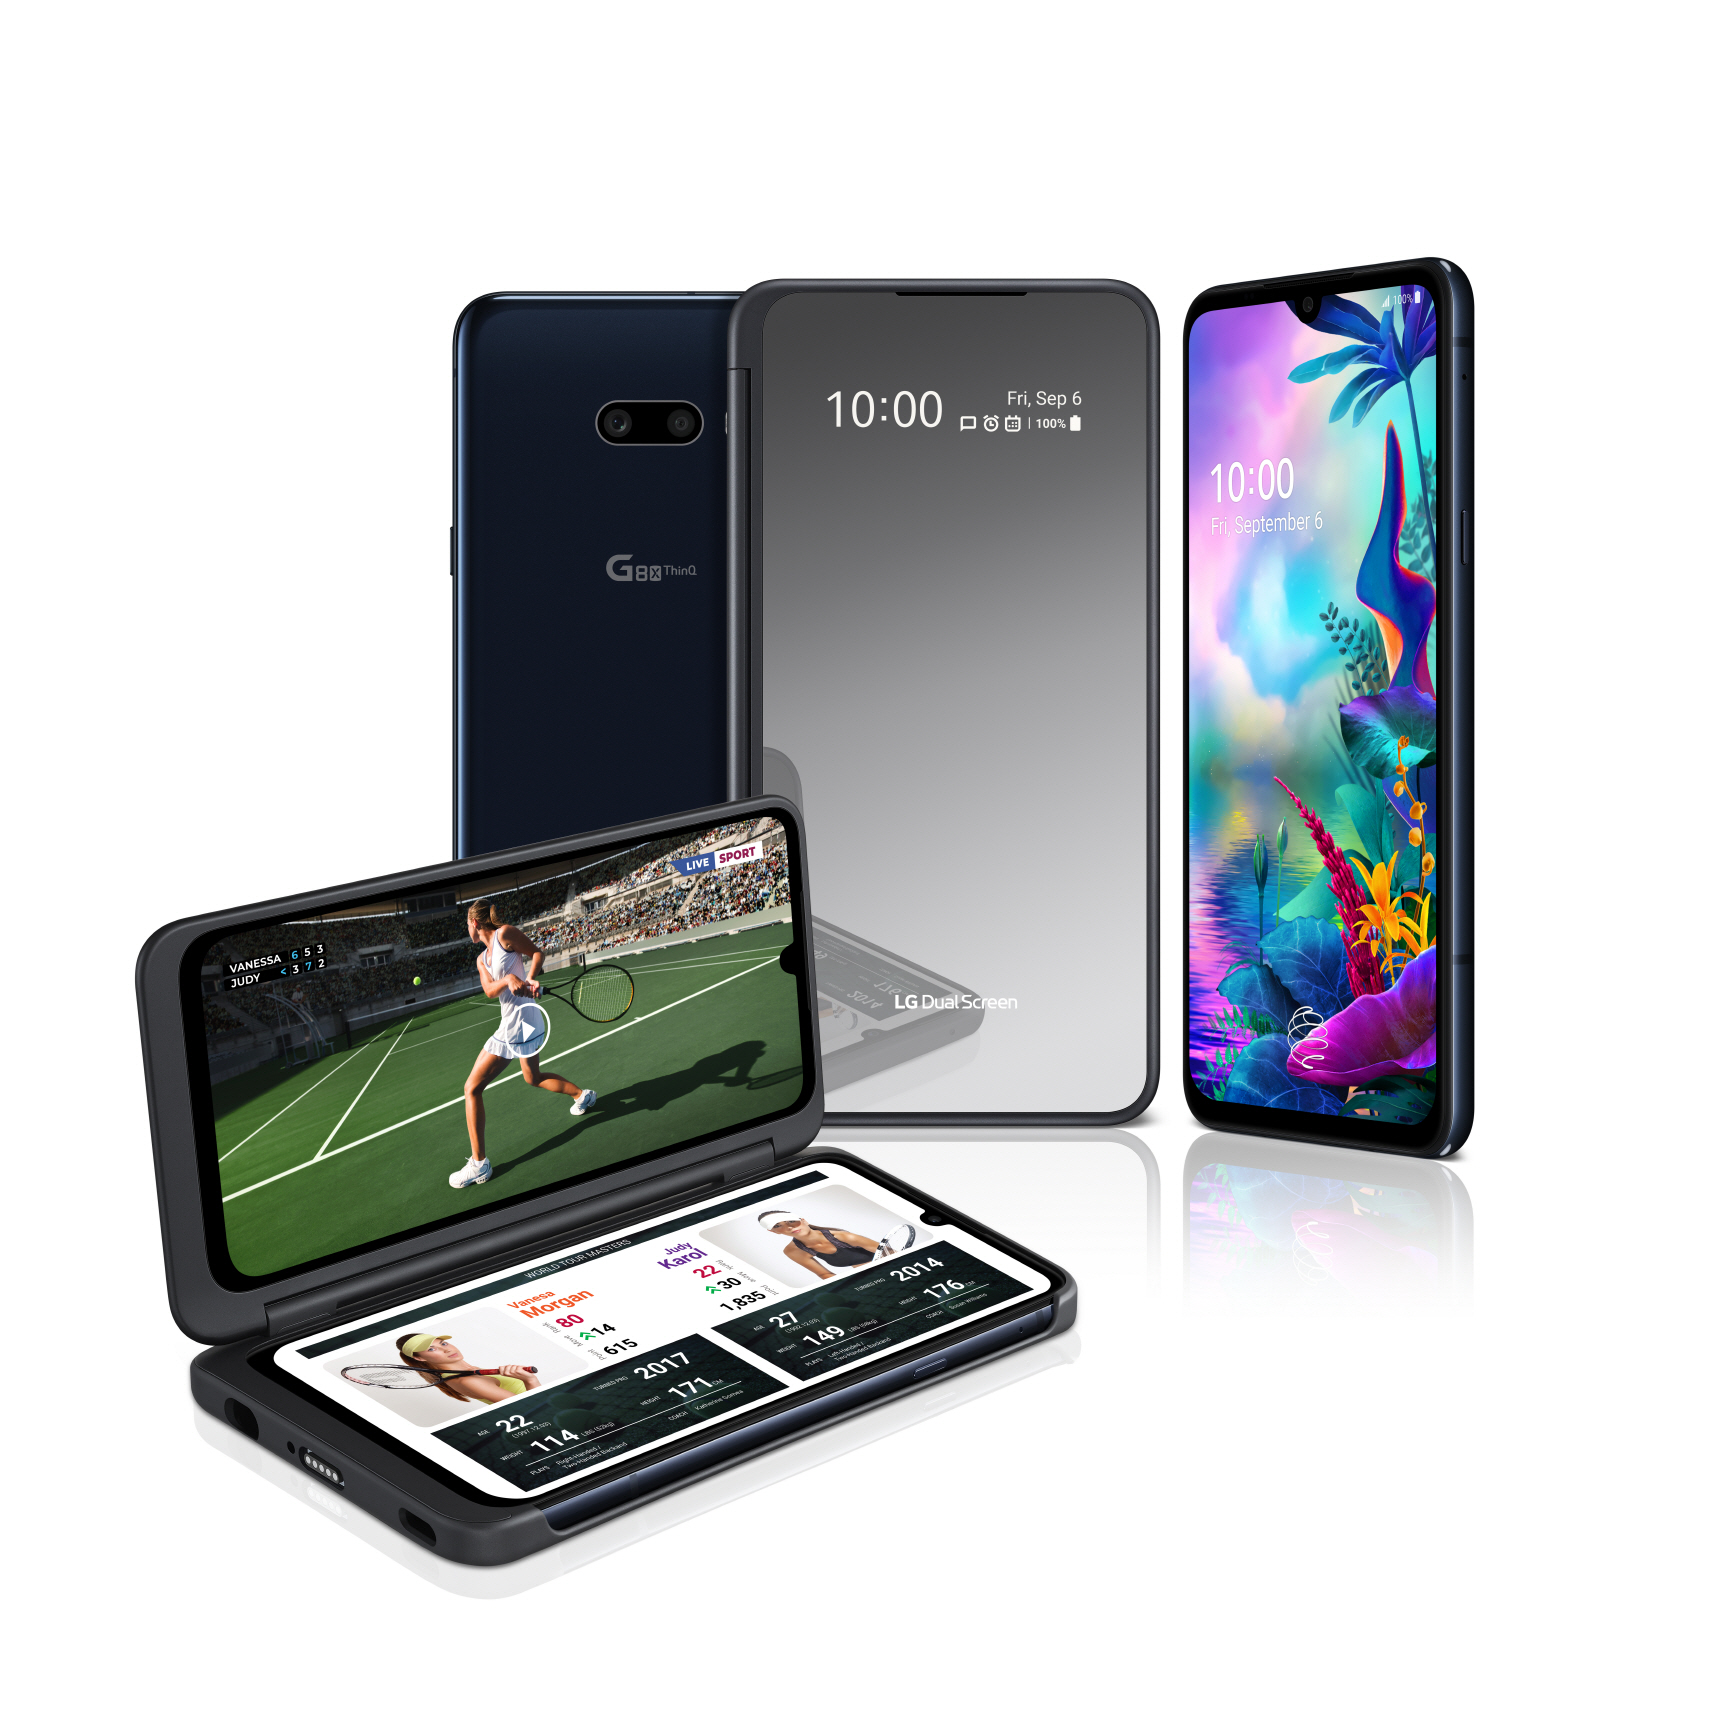 LG G8x Thinq und LG Dual Screen 01